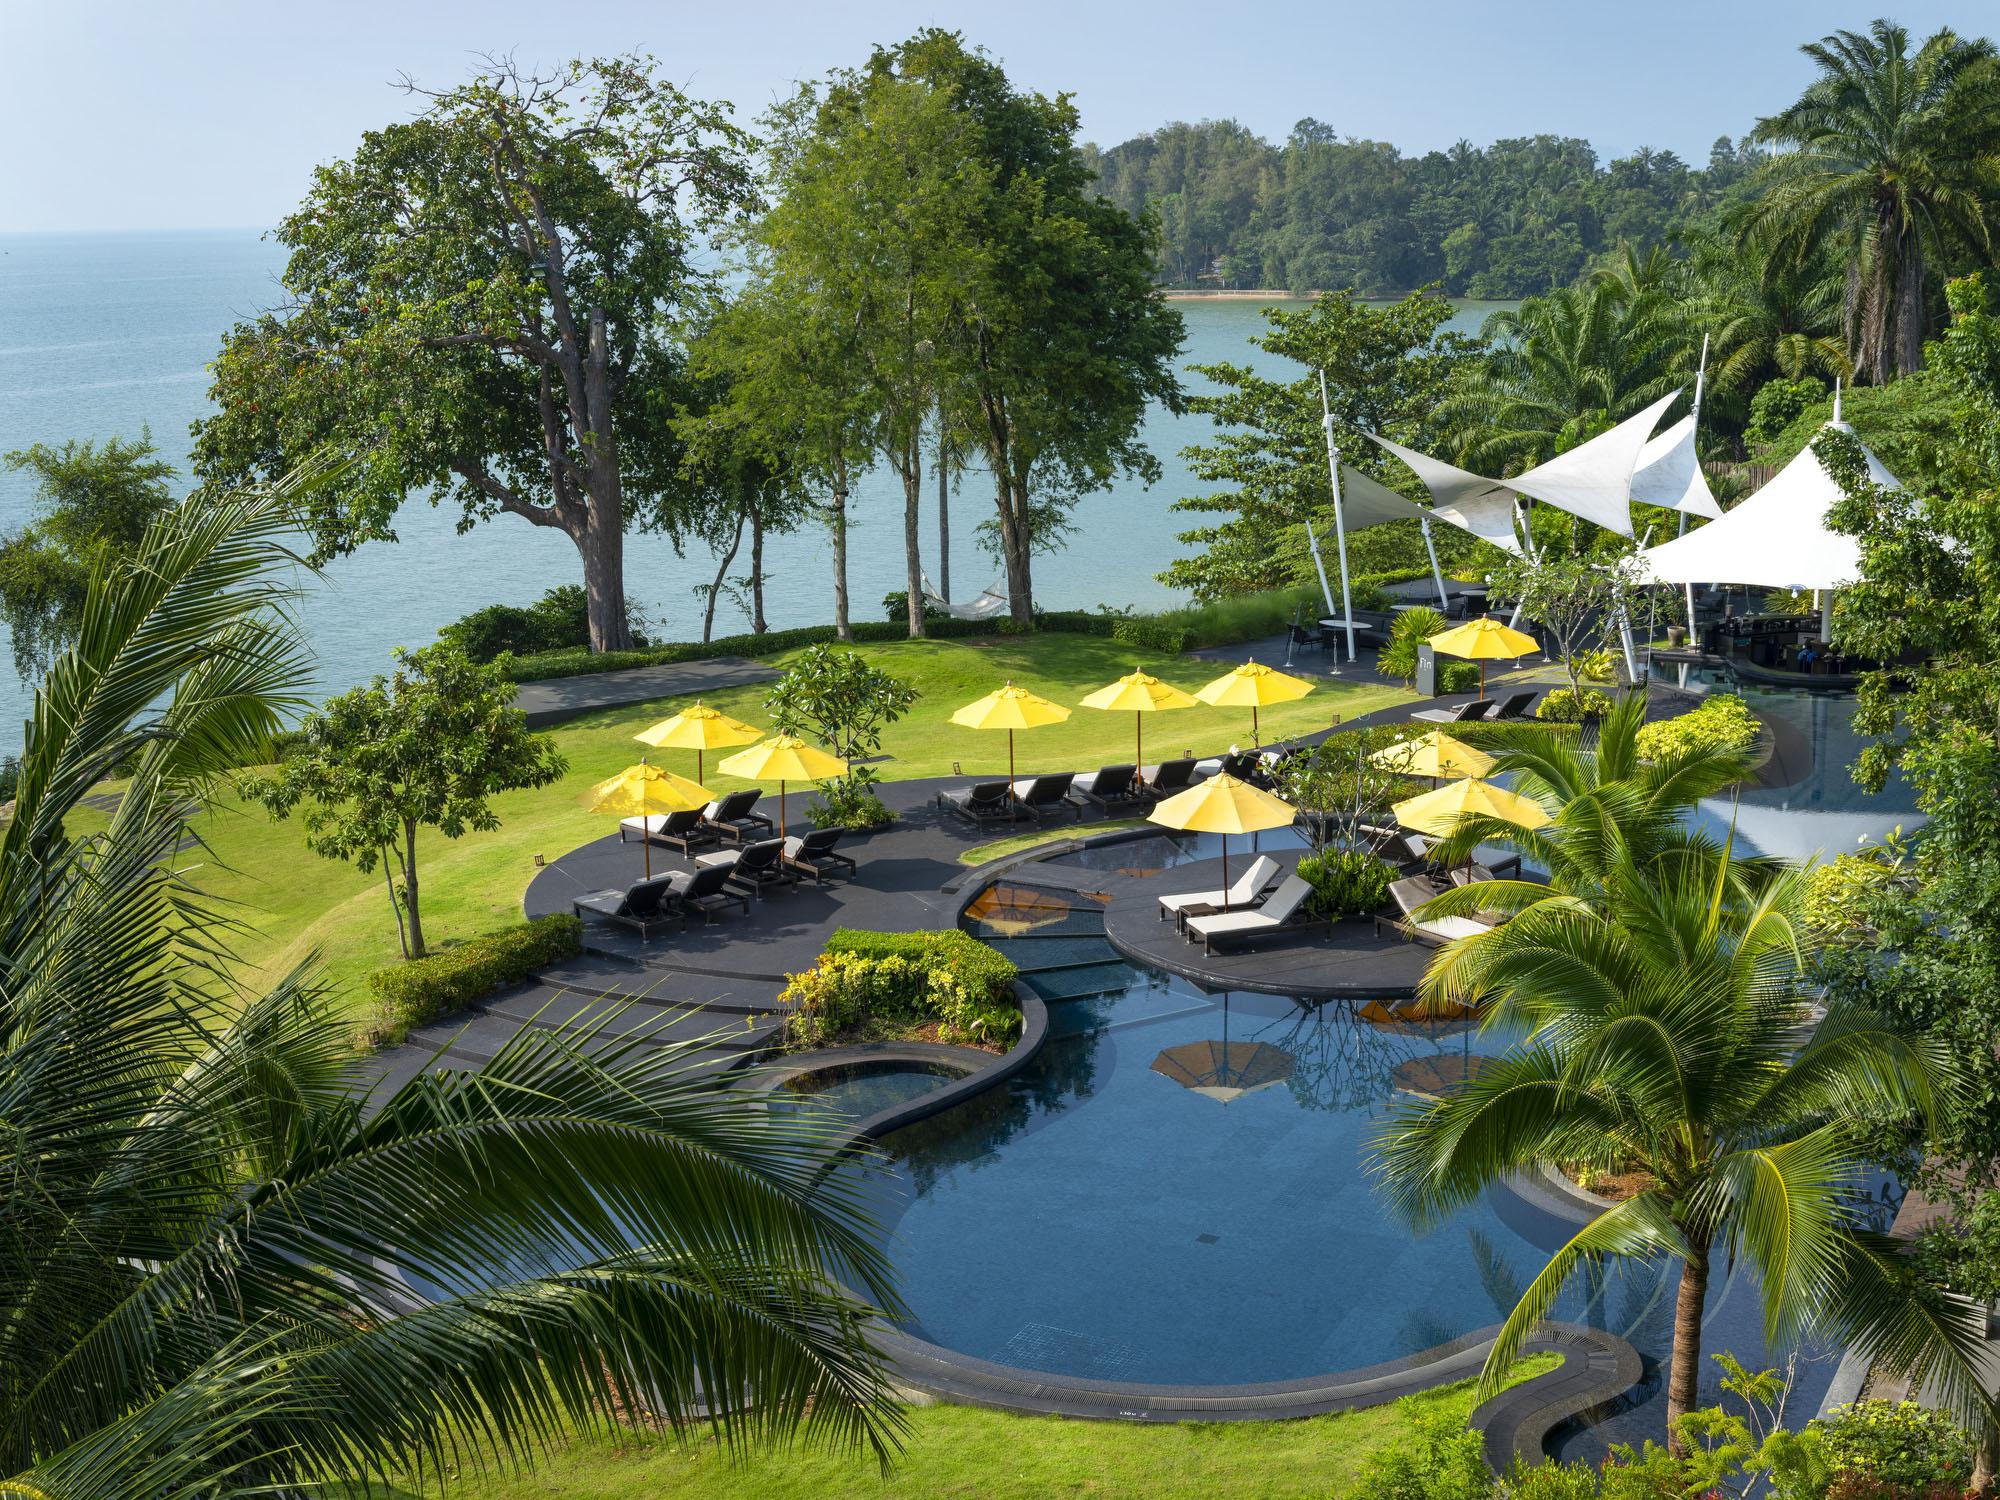 The Shellsea Krabi - Top 10 best resorts in Thailand